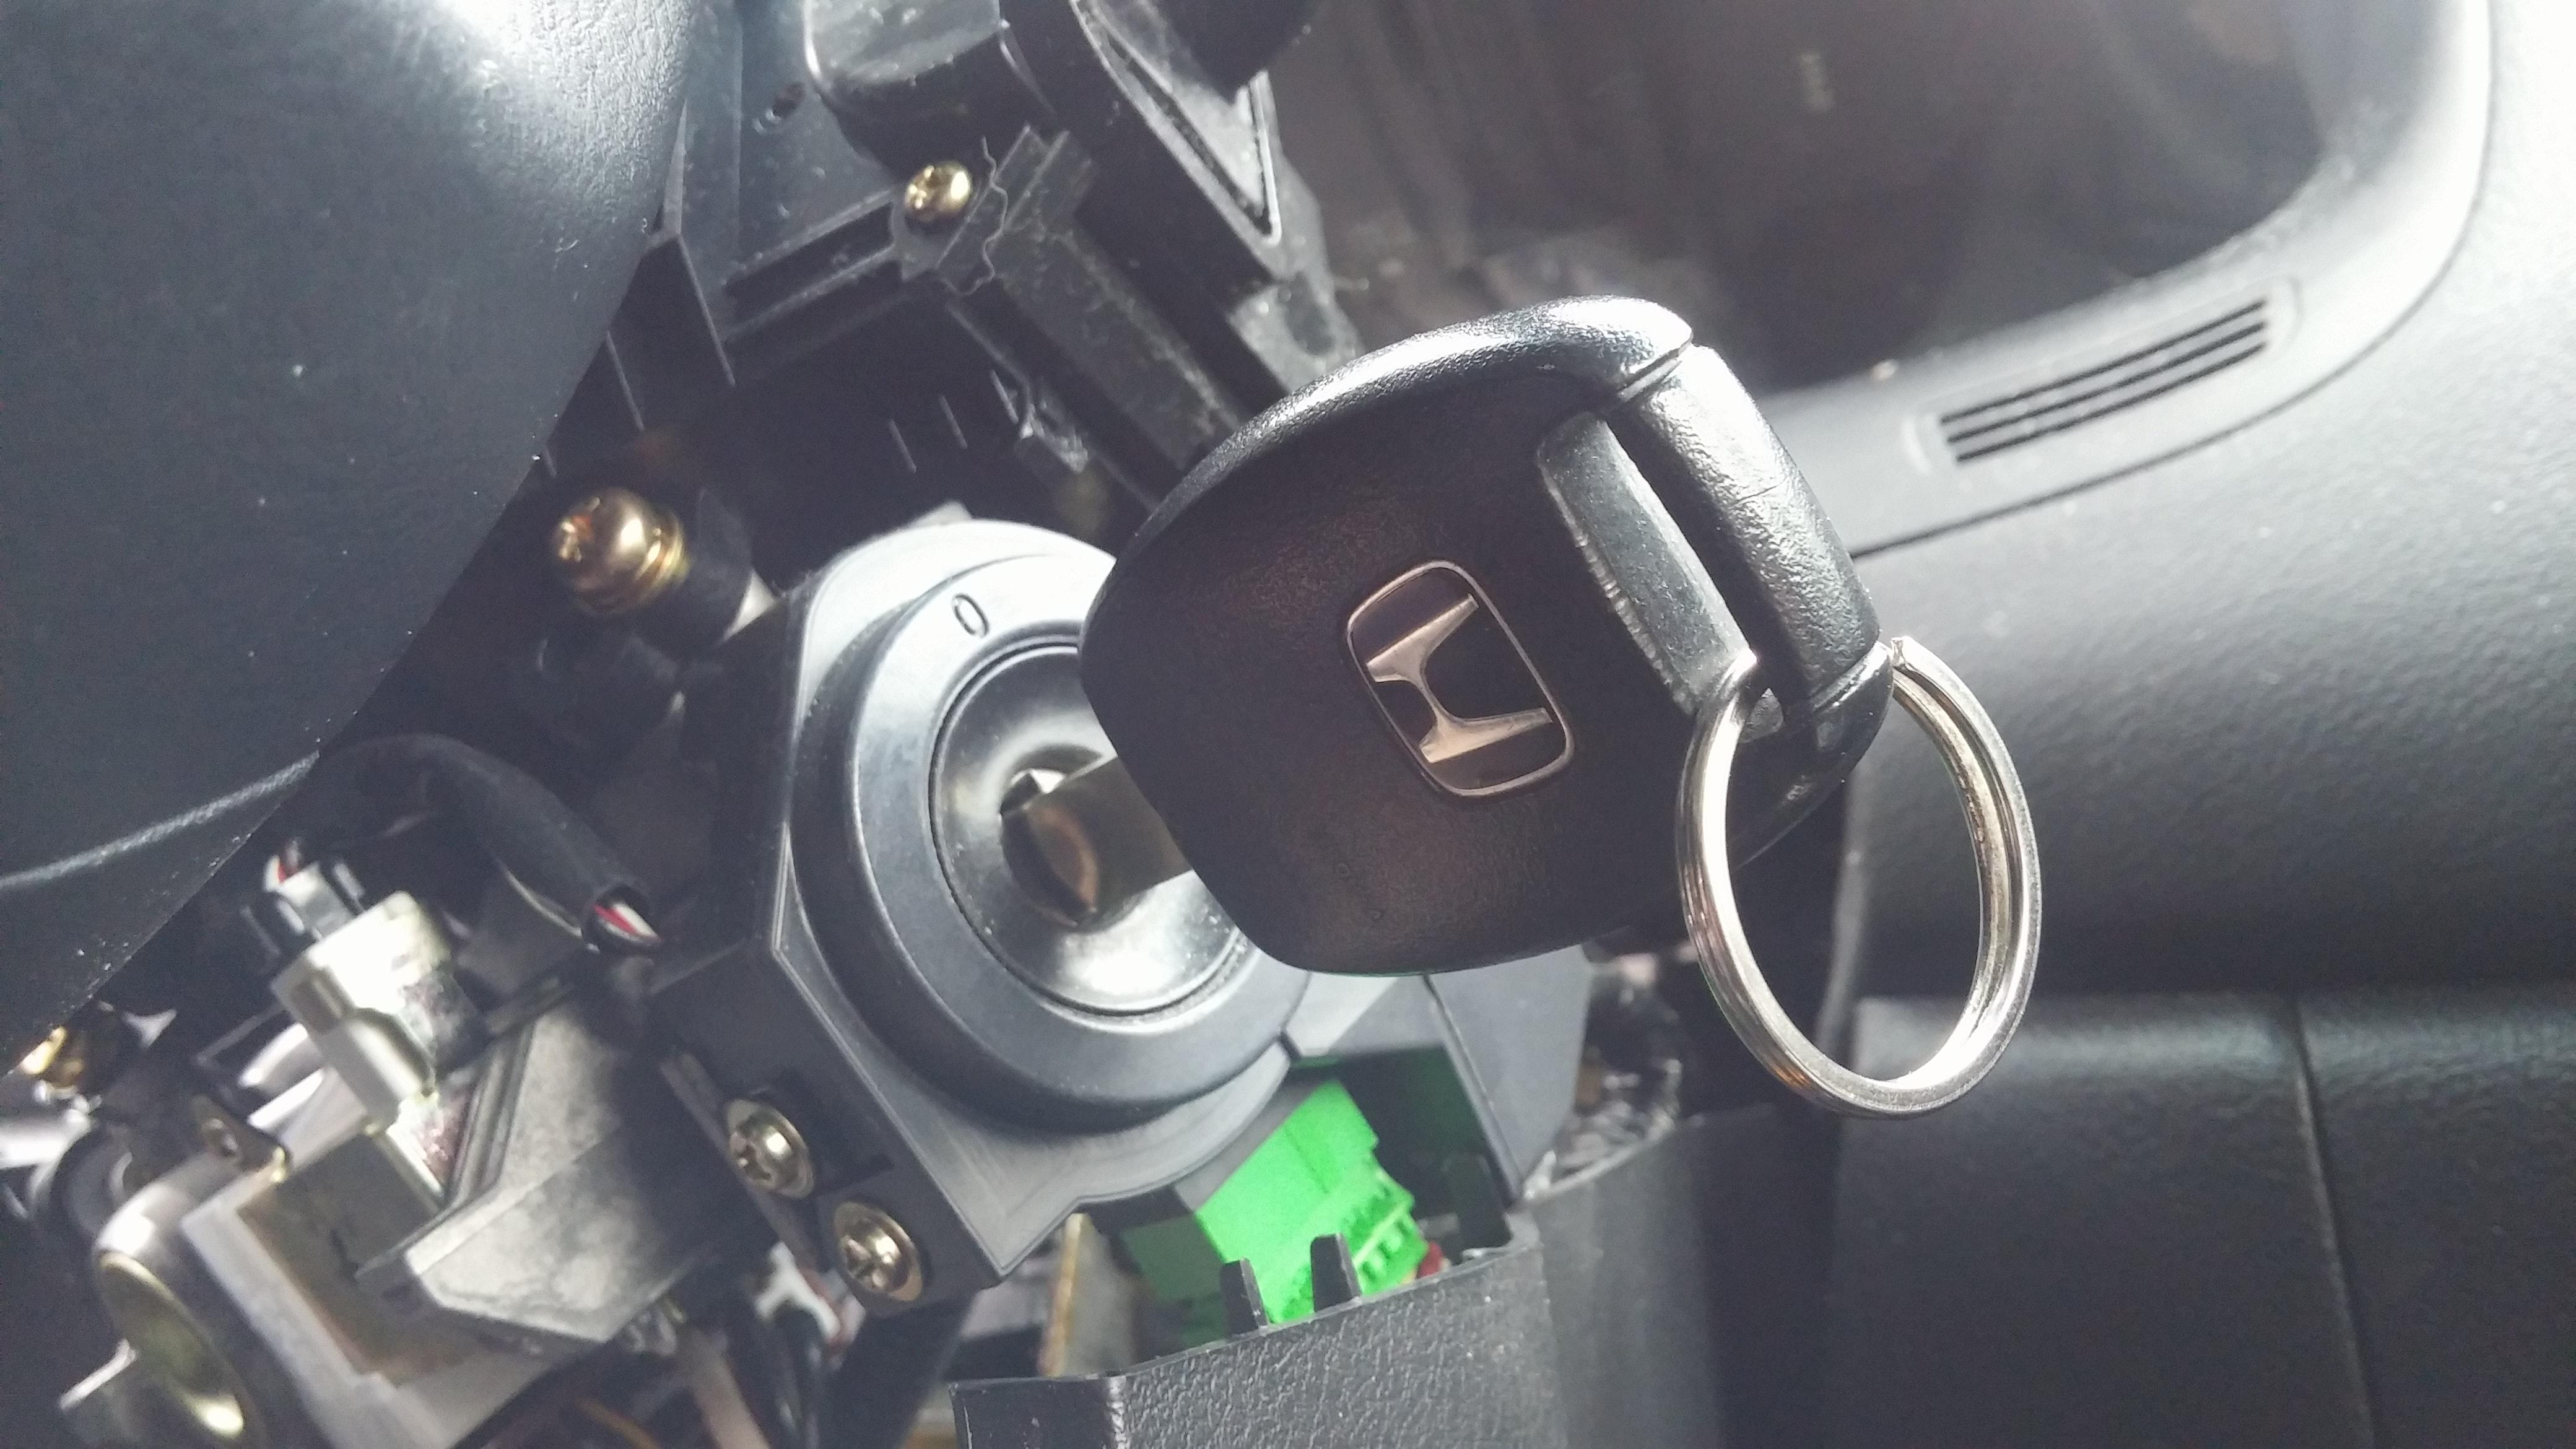 Free stock photo of auto repair, automotive locksmith, car parts